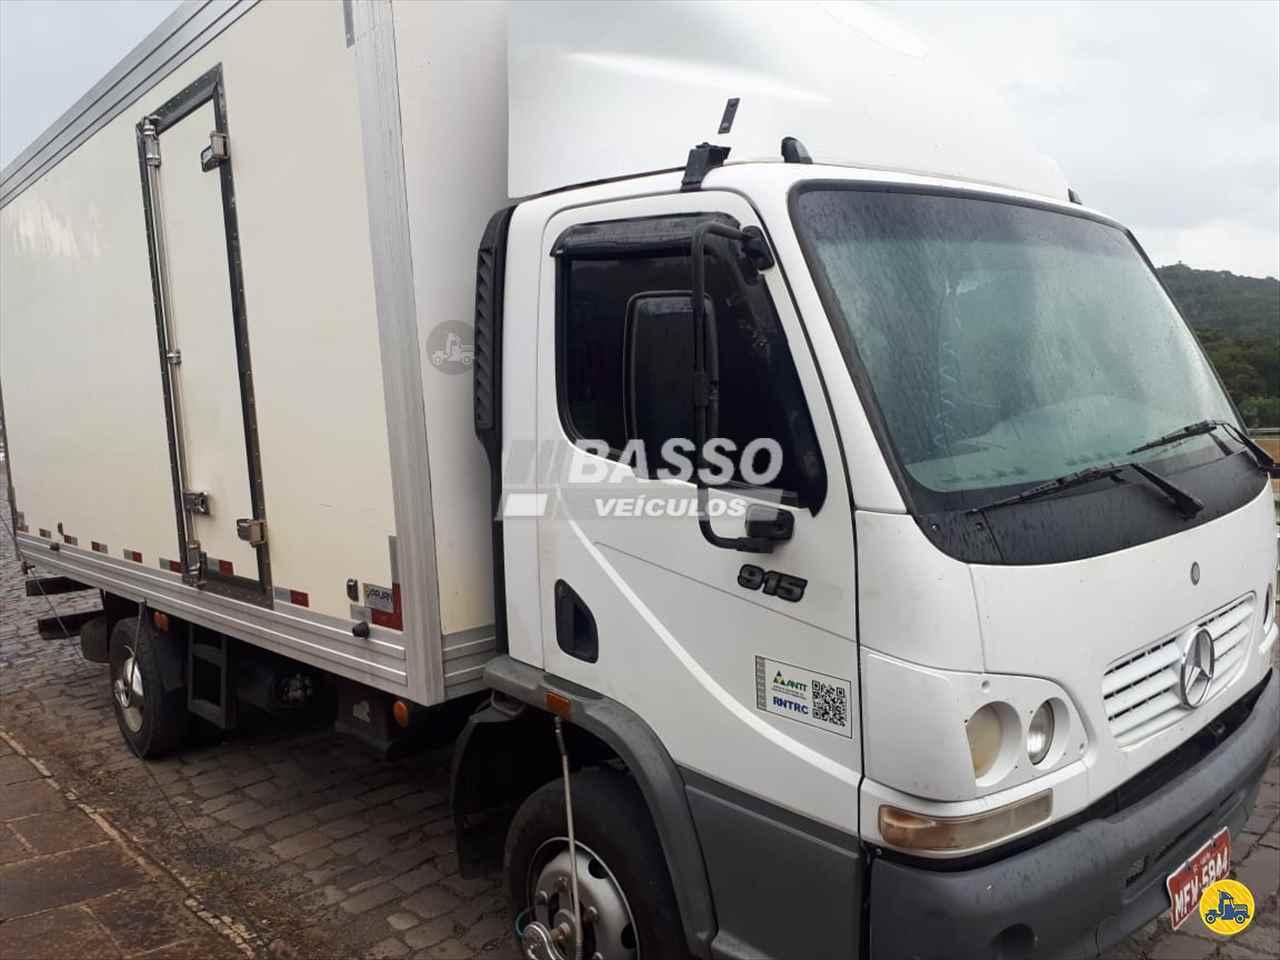 CAMINHAO MERCEDES-BENZ MB 915 Baú Frigorífico 3/4 4x2 Basso Veículos GARIBALDI RIO GRANDE DO SUL RS